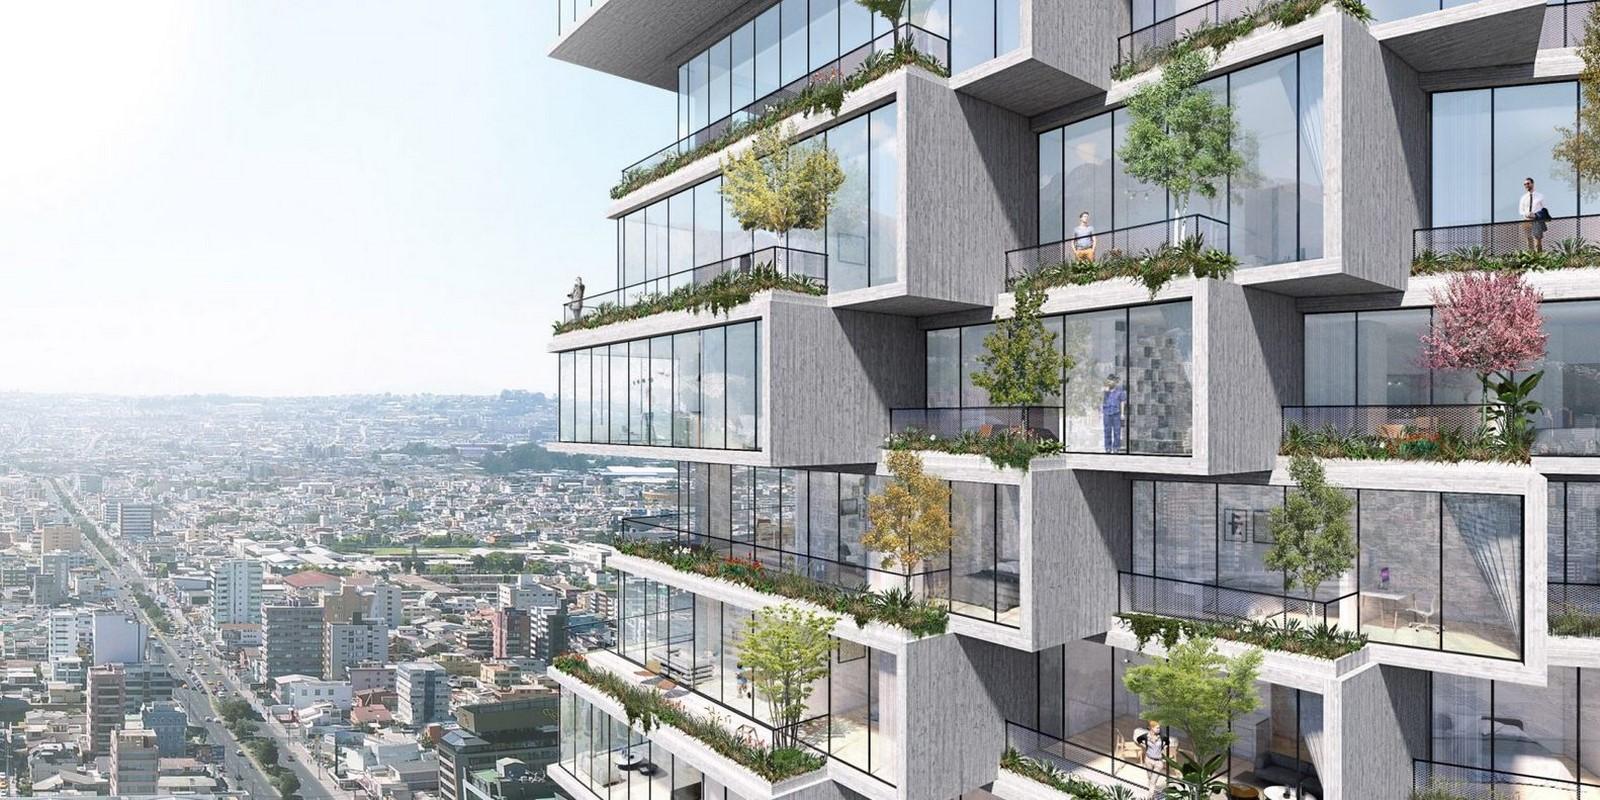 10 Examples of Innovative facade design solutions - Sheet21